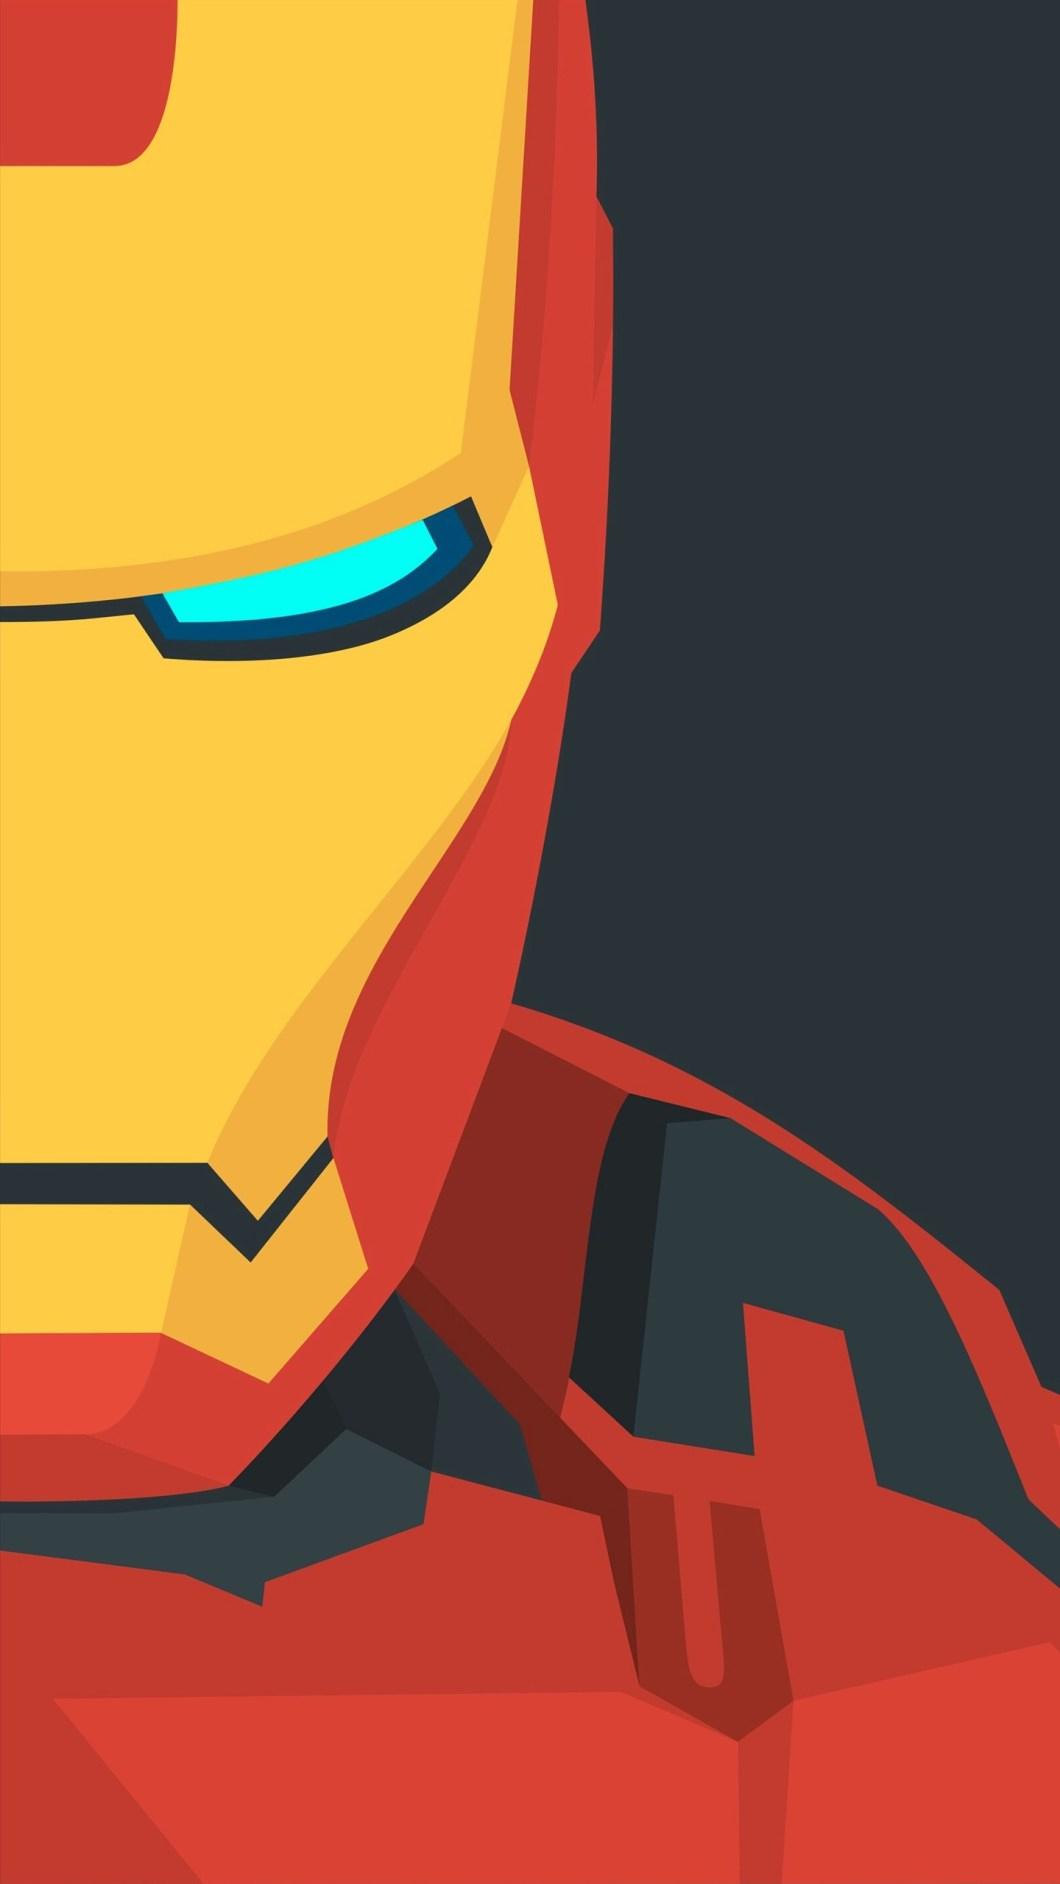 iron man wallpaper 4k iphone x | shareimages.co